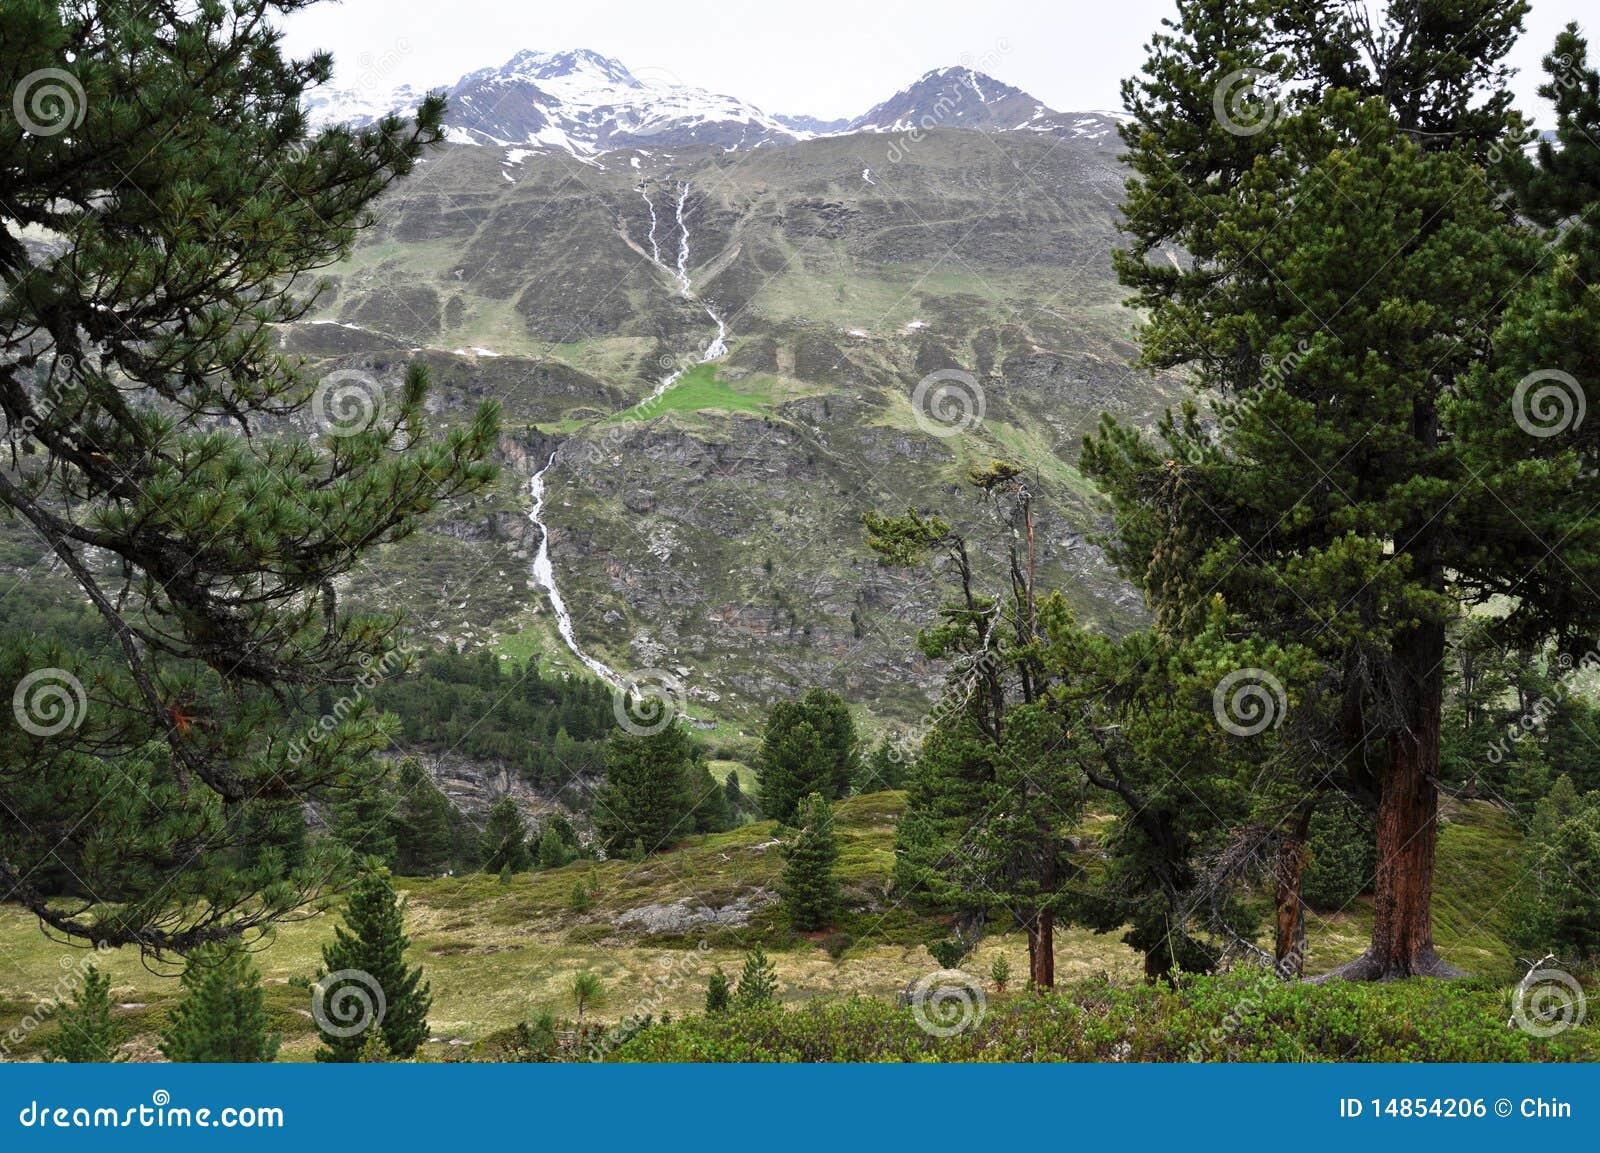 Swiss Pine forest of Obergurgl, Austria